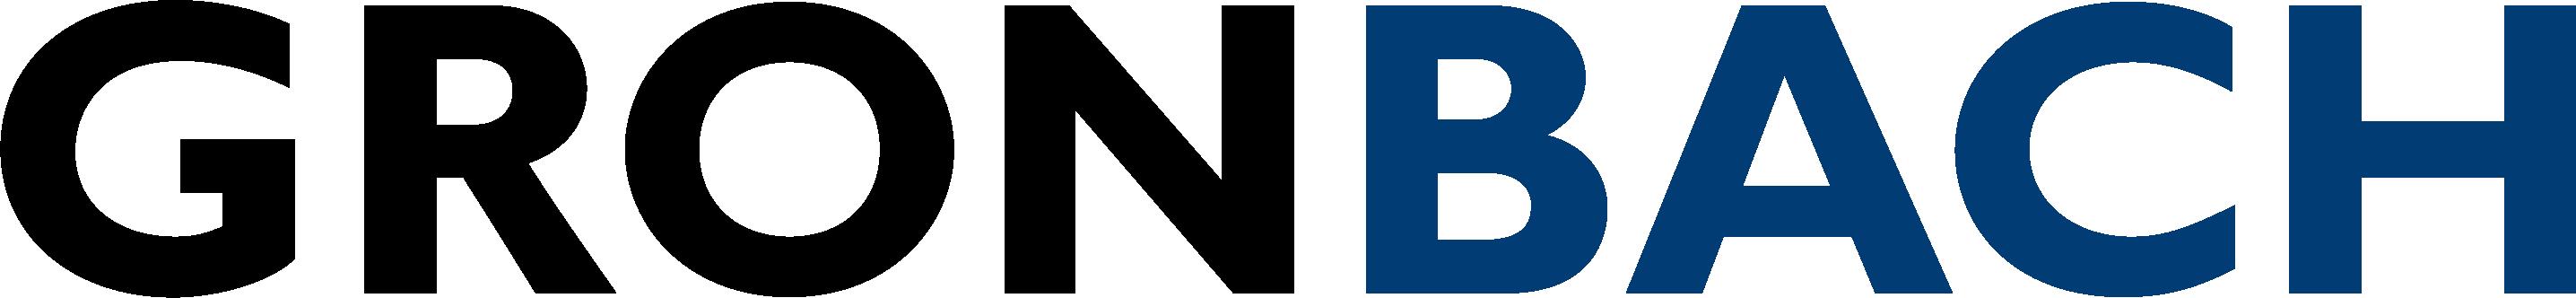 Wilhelm Gronbach GmbH & Co KG